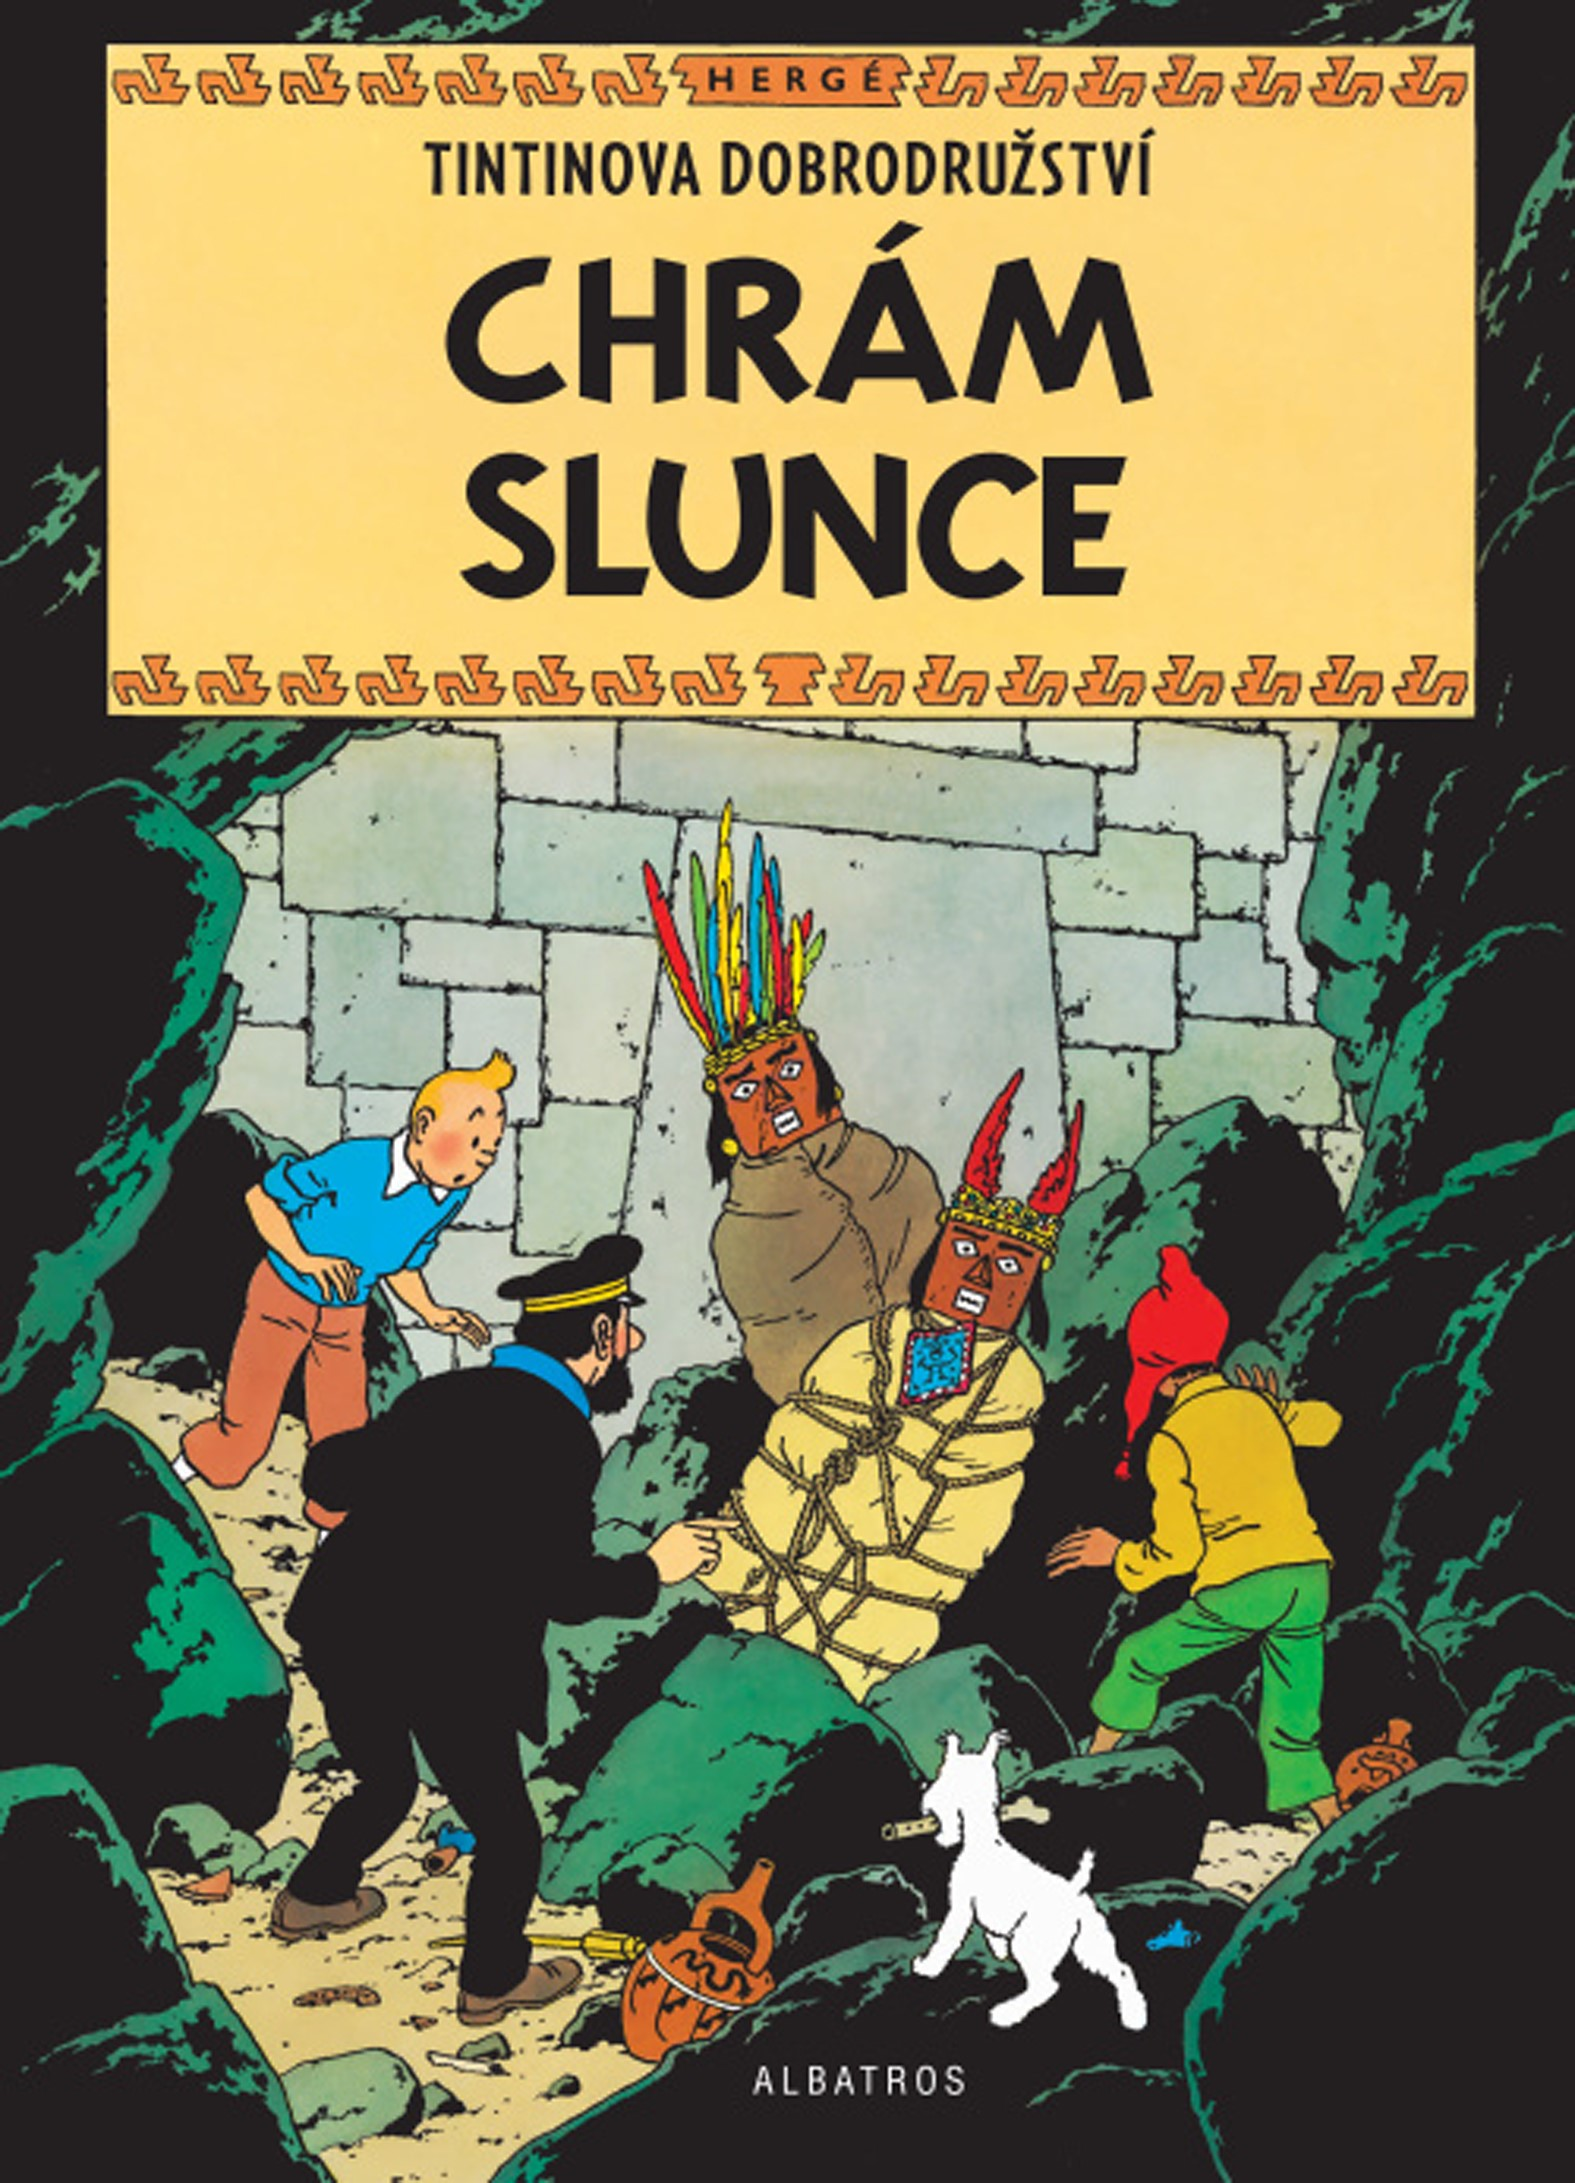 Tintin 14 - Chrám Slunce